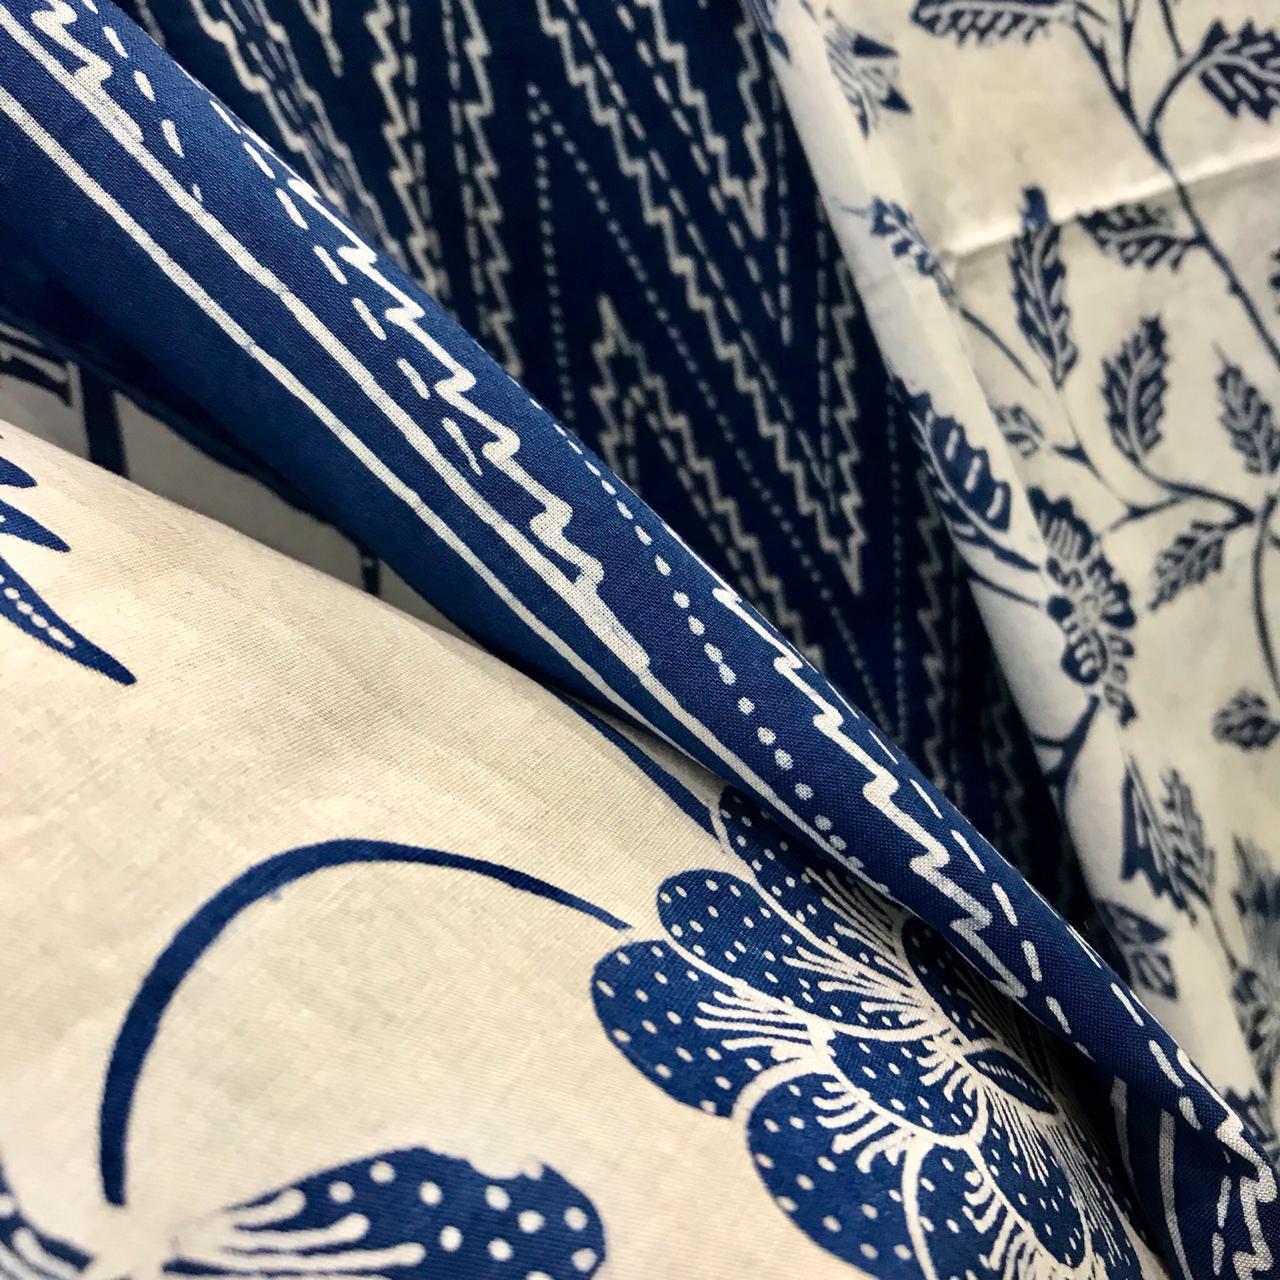 Si Biru Cantik Yang Populer — Yayasan Losari